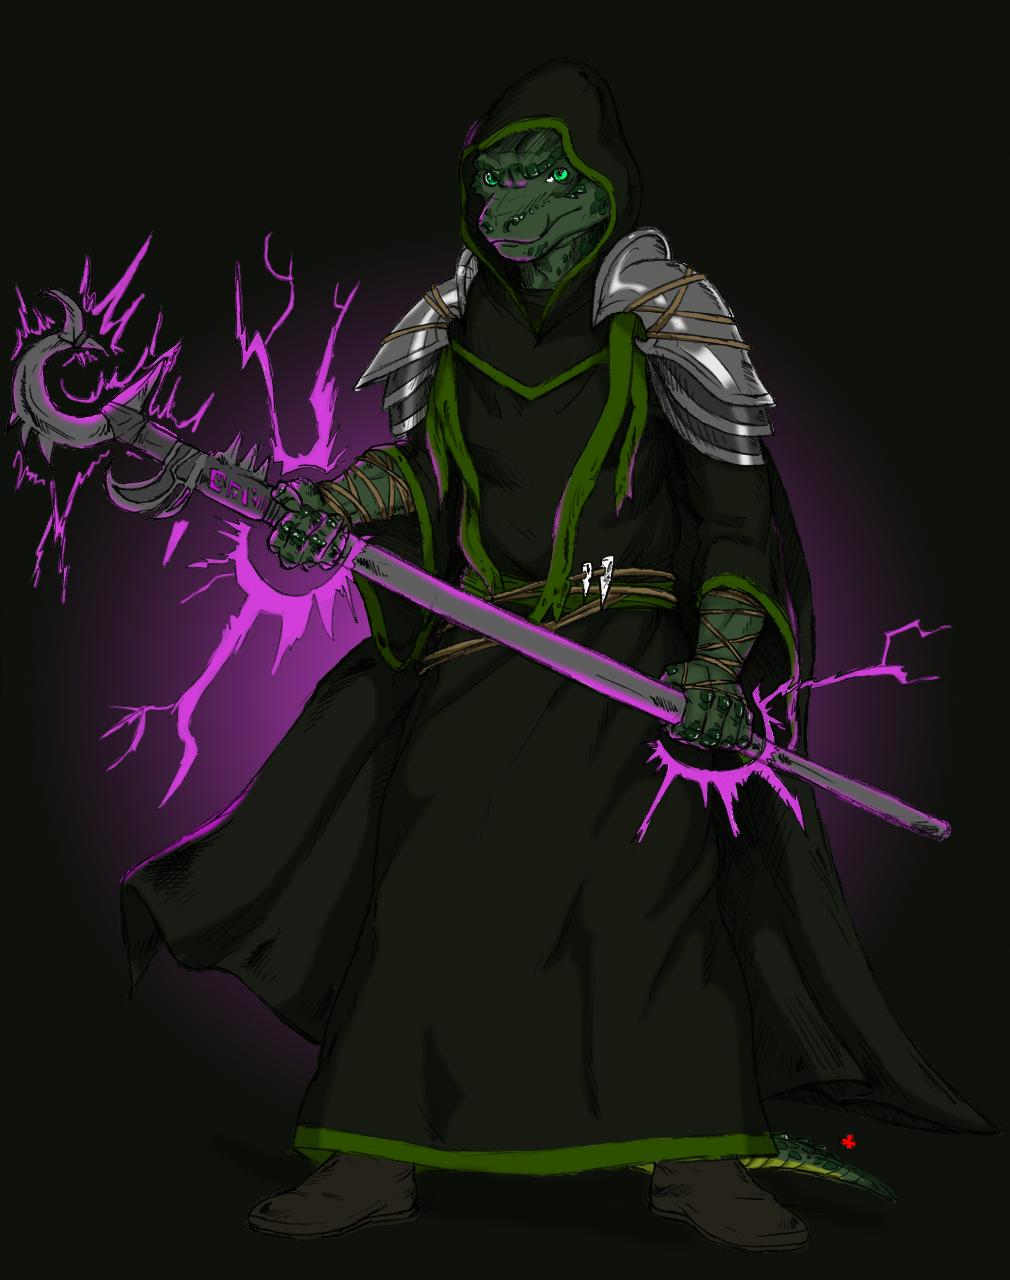 Commission (Colors) - Magical ass shit yo